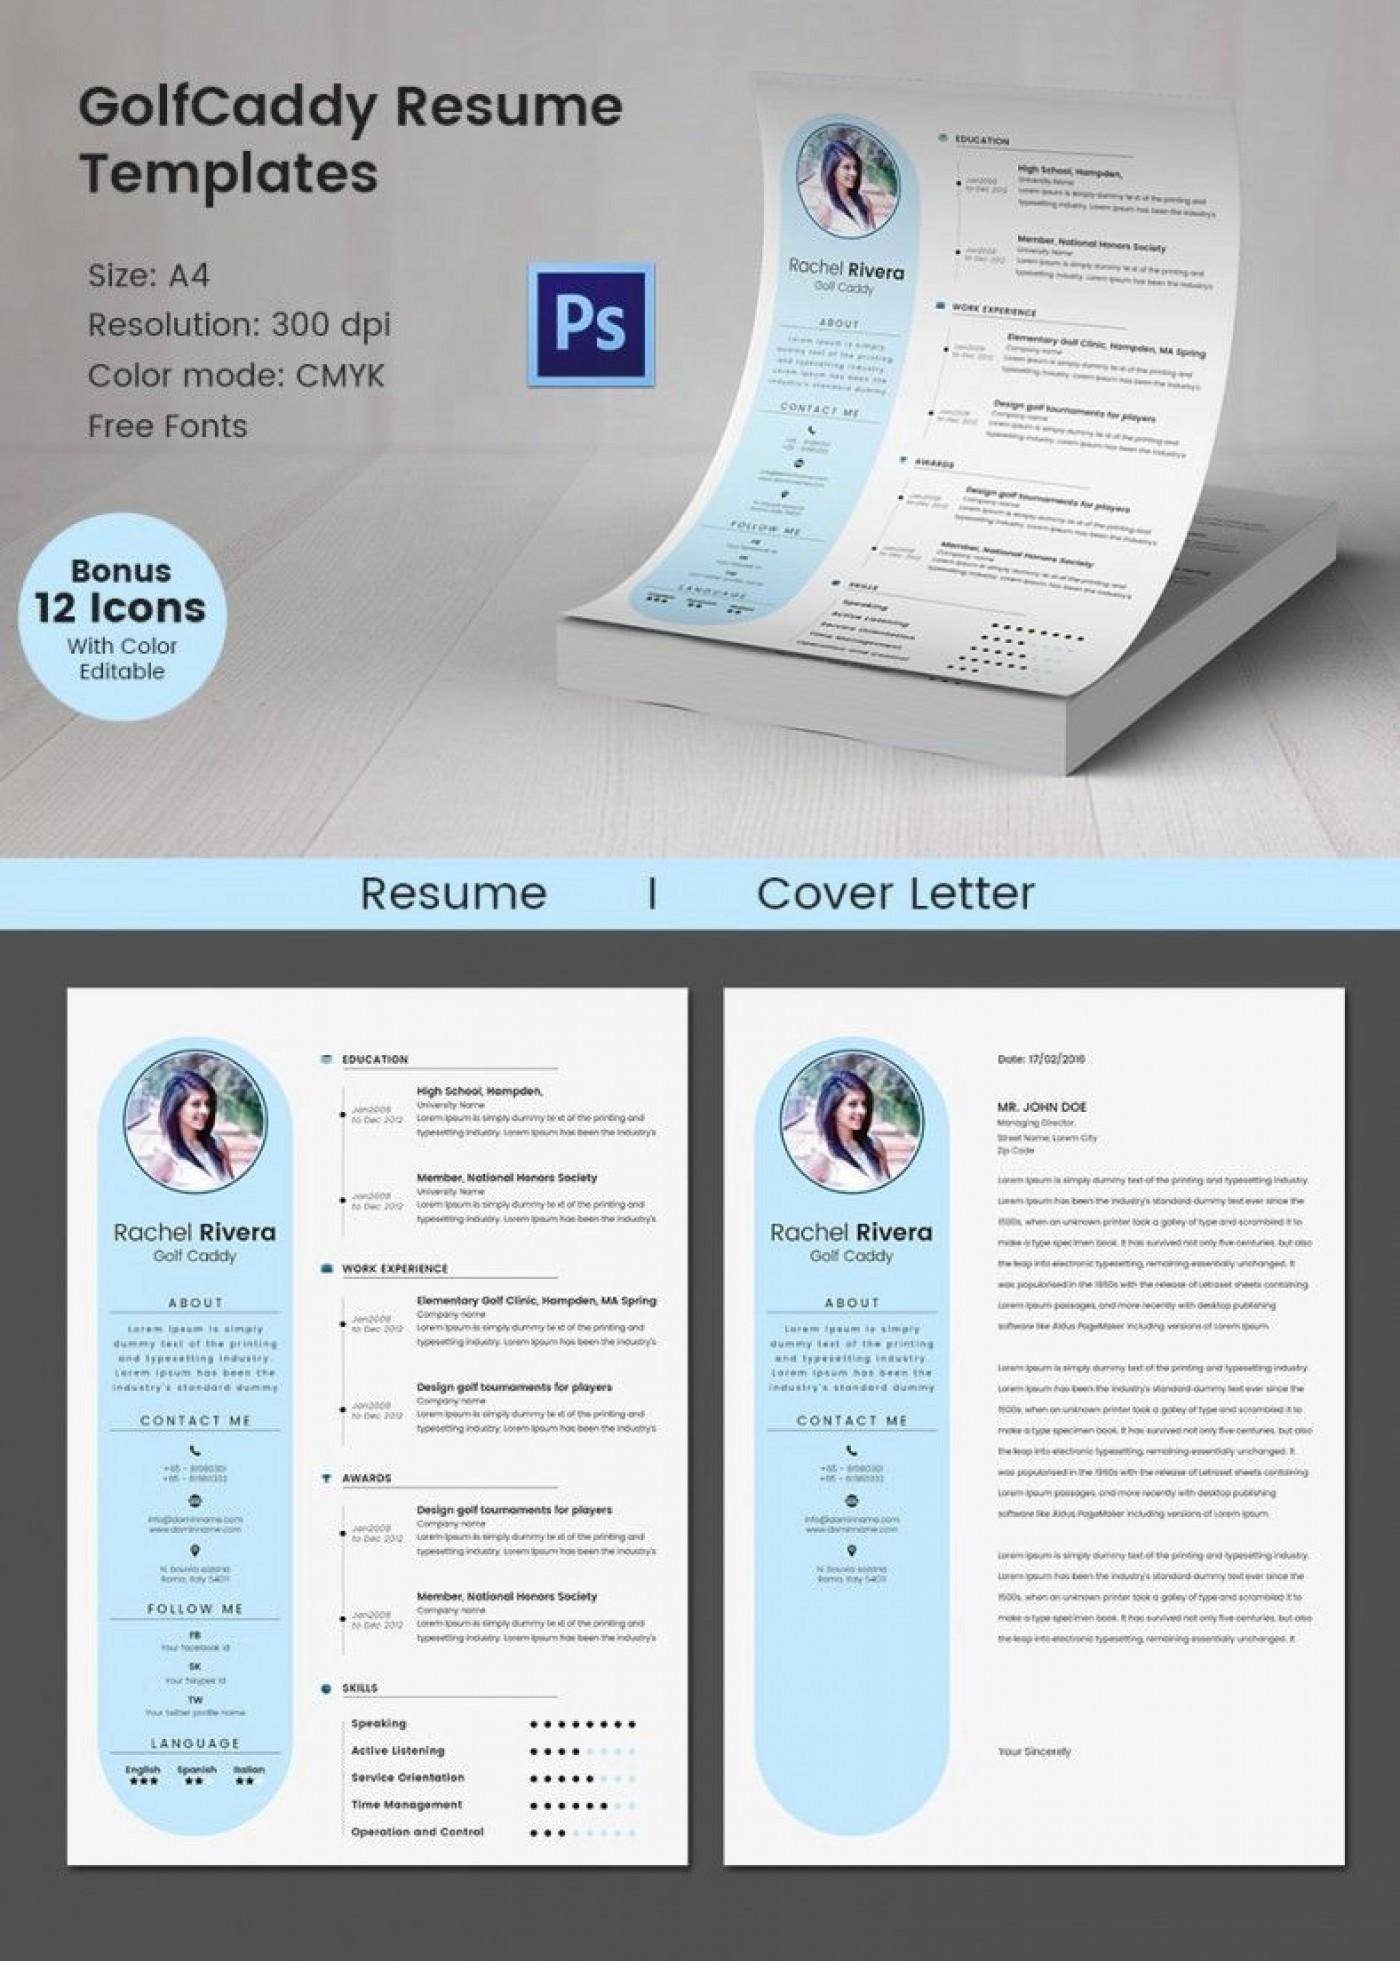 009 Excellent Software Engineering Resume Template High Def  Engineer Microsoft Word Cv Free Developer Download1400